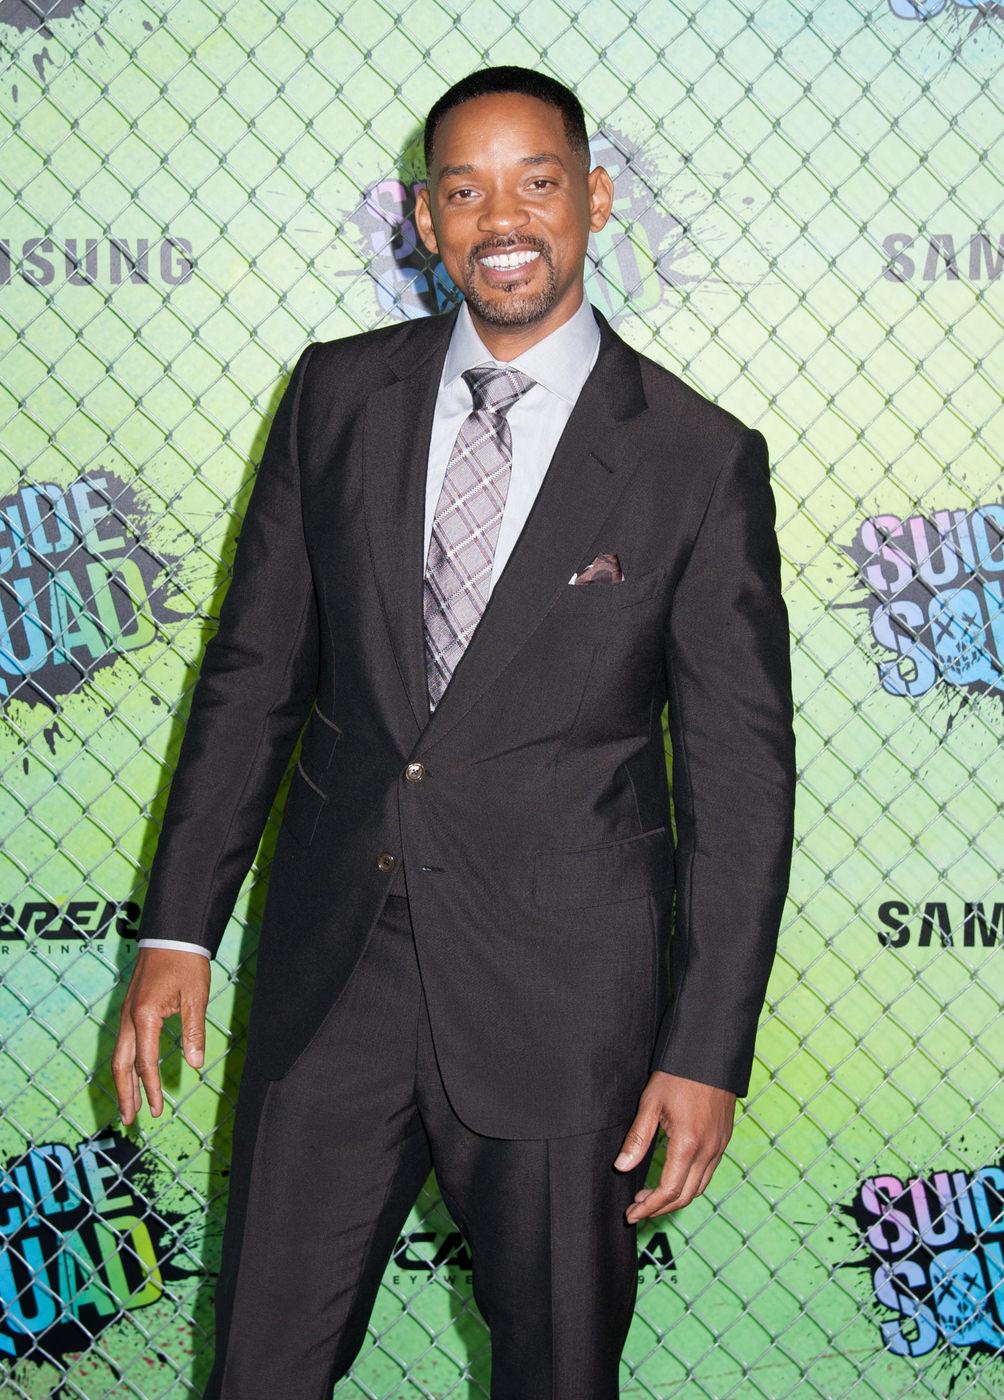 Will-Smith-Suicide-Squad-Movie-World-Premiere-Red-Carpet-Fashion-Tom-Ford-Tom-Lorenzo-Site (1)